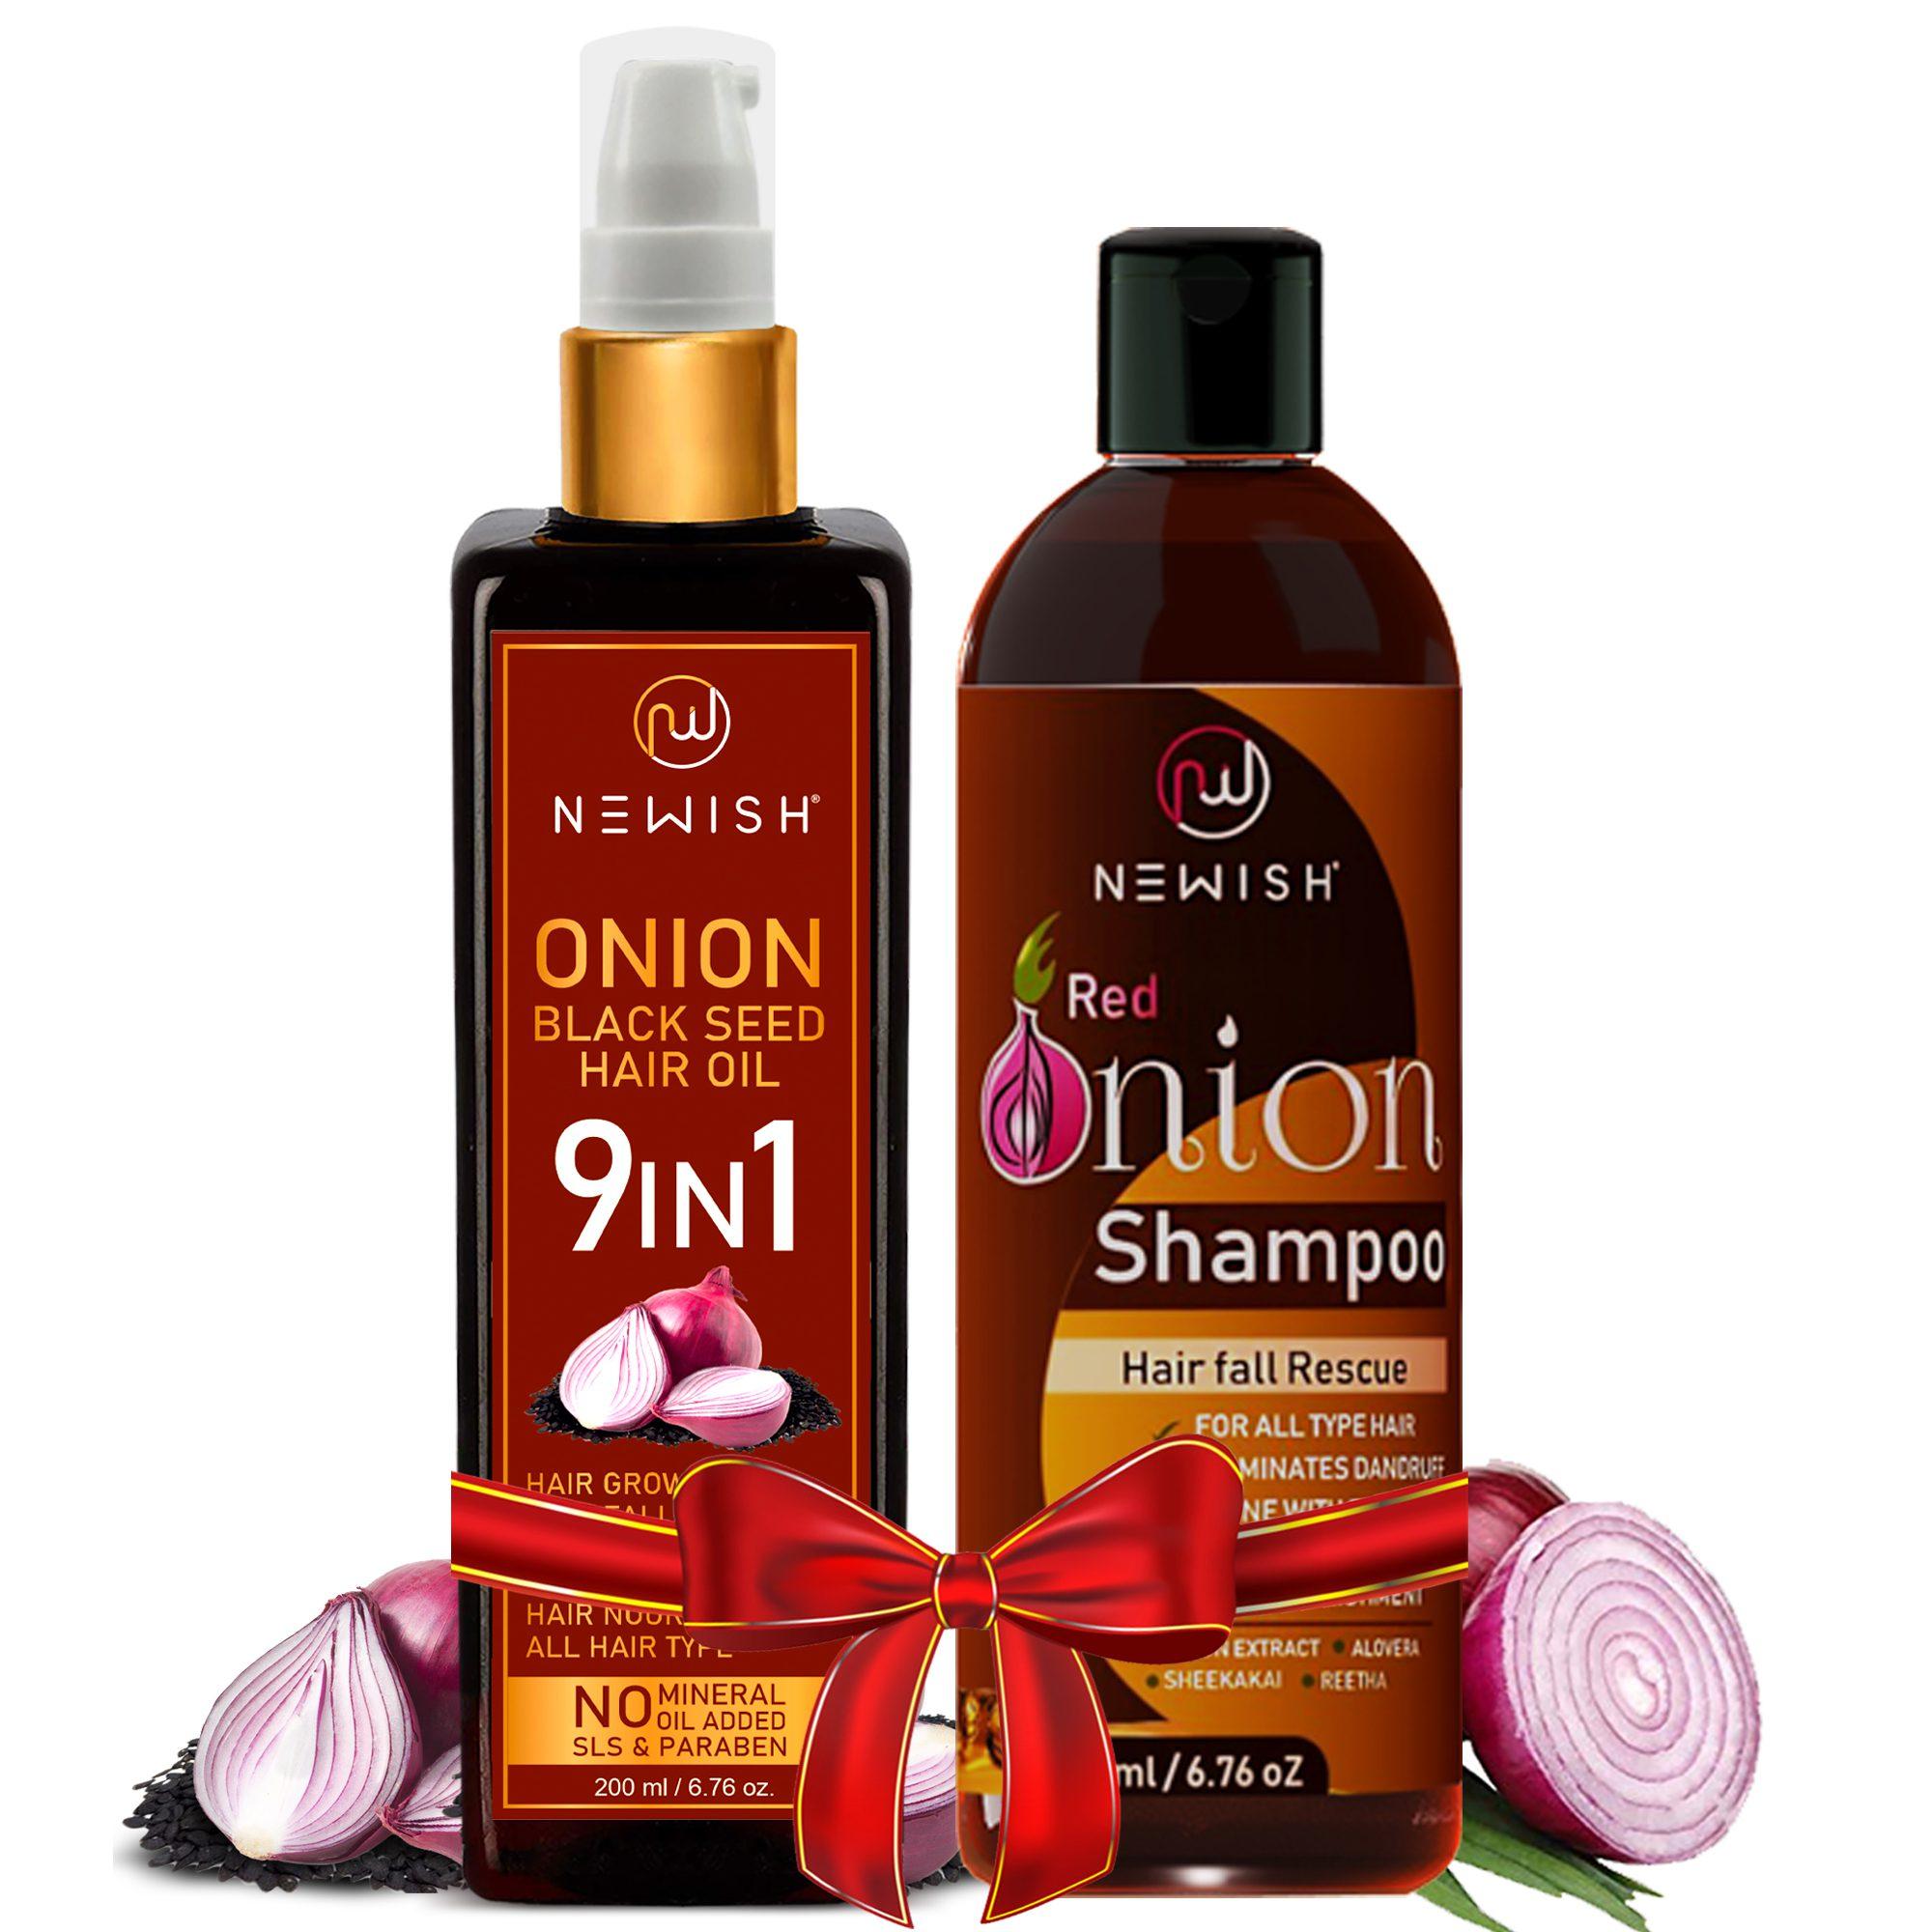 onion oil and shampoo for hair